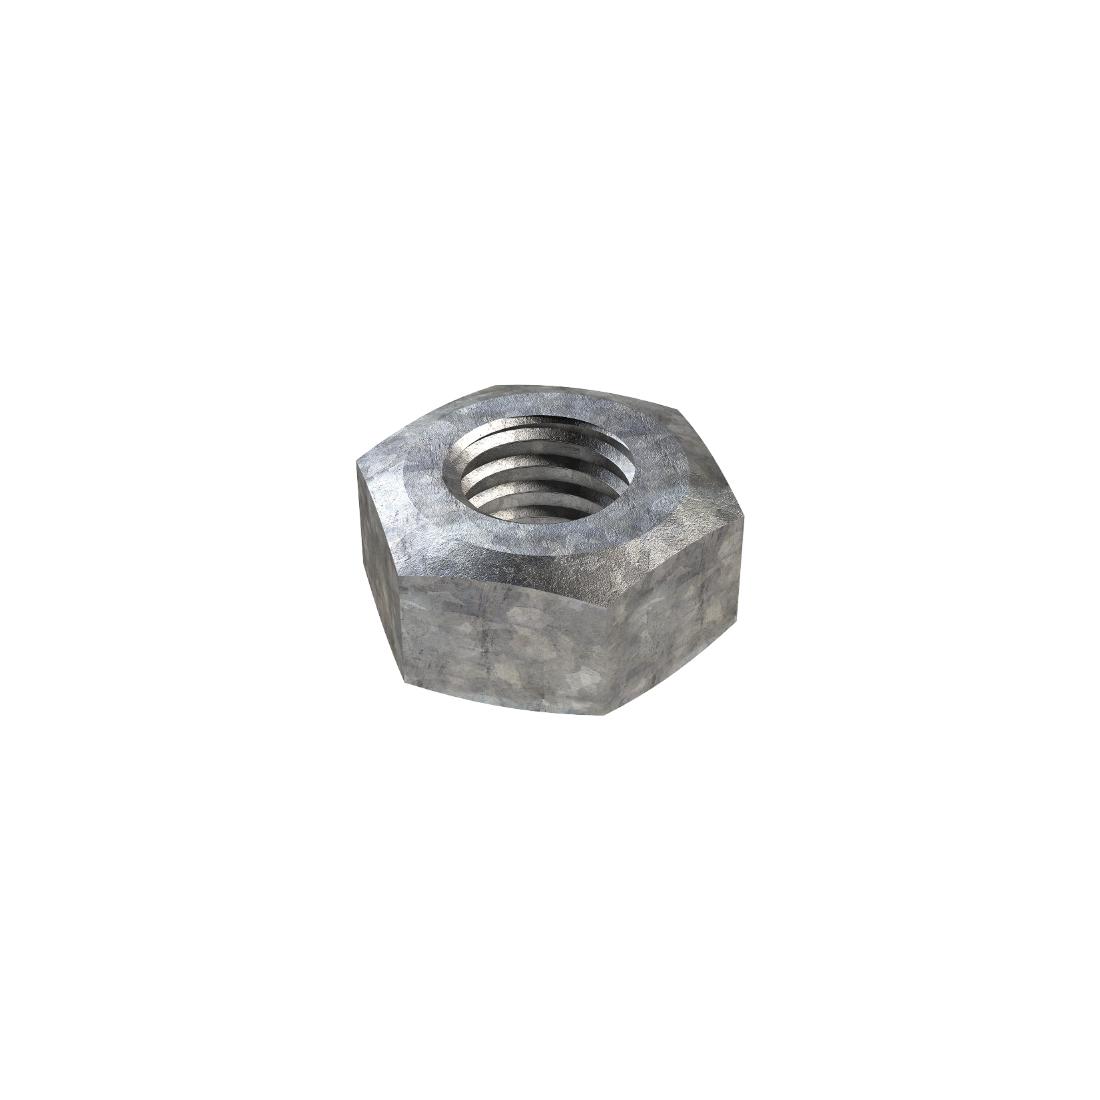 Hexagon Nut M12 Class 8 Galvanised N46MG1200P6